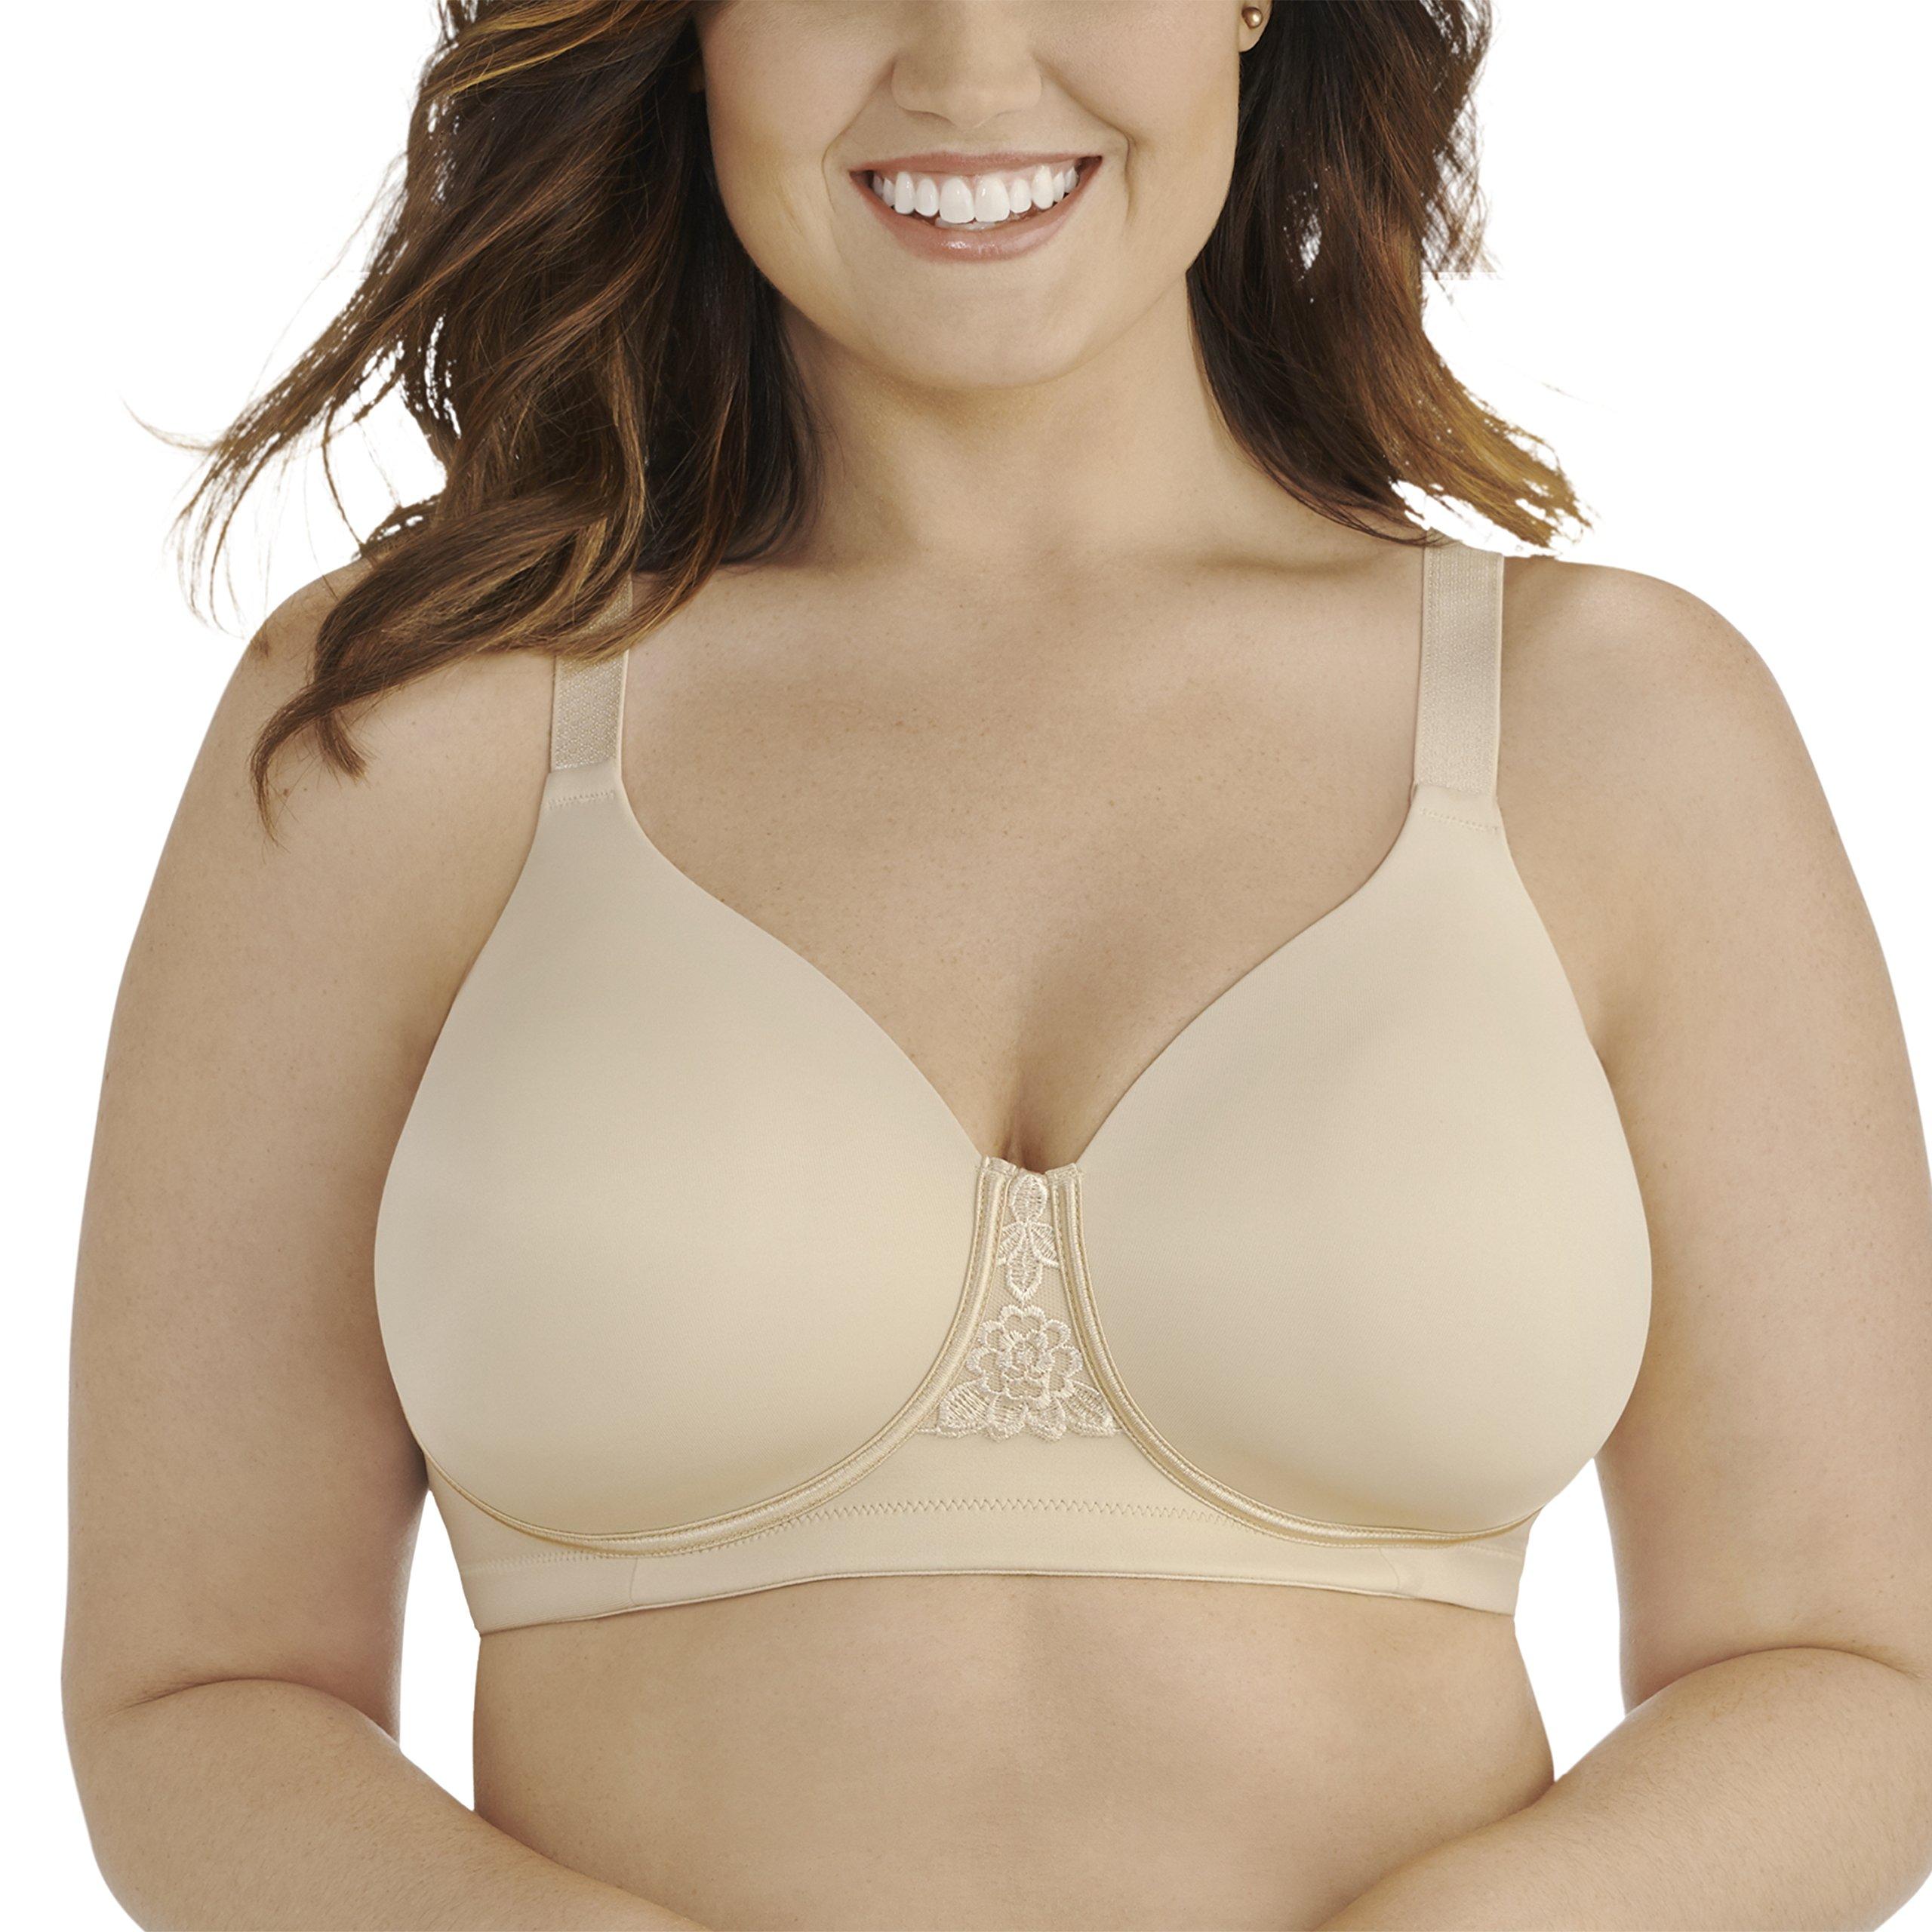 043b64a589 Vanity Fair Women s Beauty Back Full Figure Wirefree Bra 71380 product image